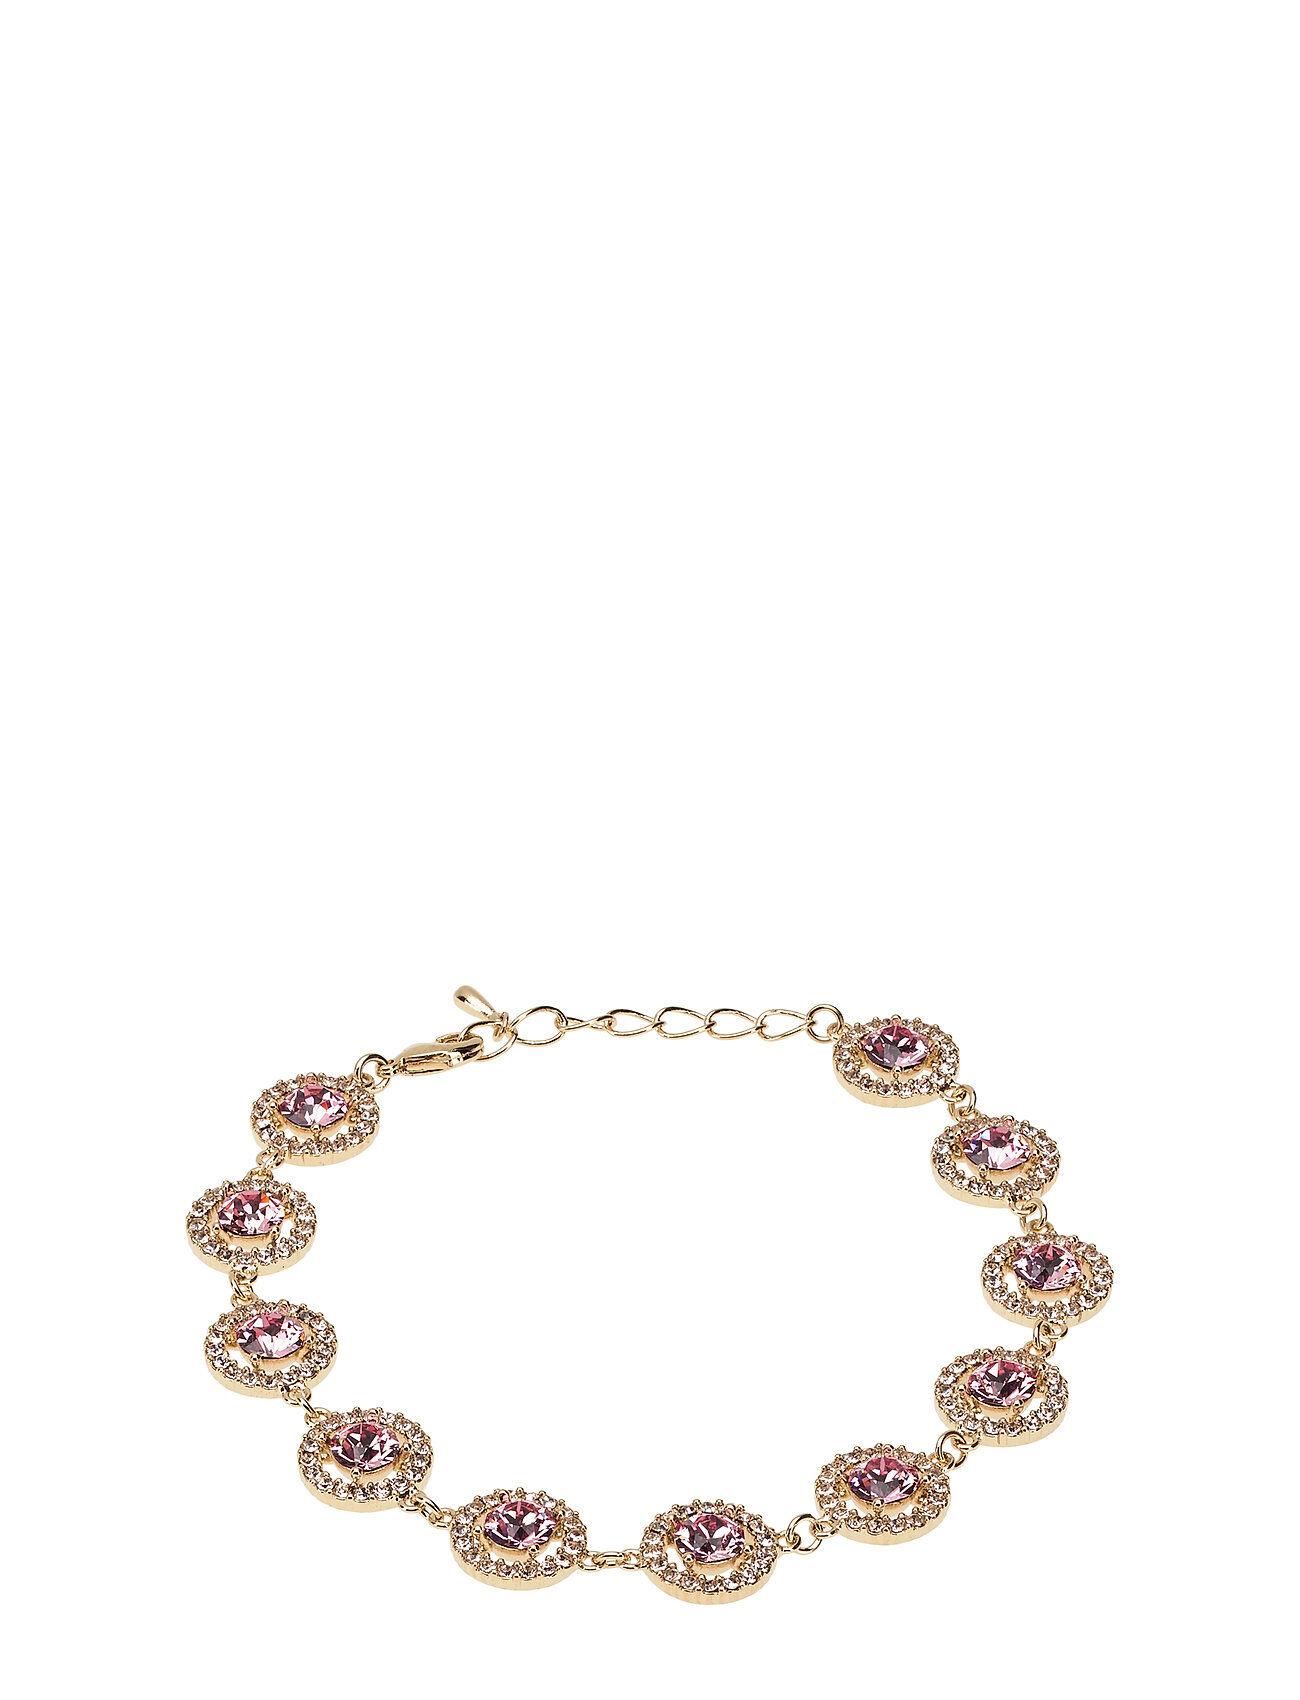 LILY AND ROSE Miranda Bracelet - Light Rose Accessories Jewellery Bracelets Chain Bracelets Vaaleanpunainen LILY AND ROSE